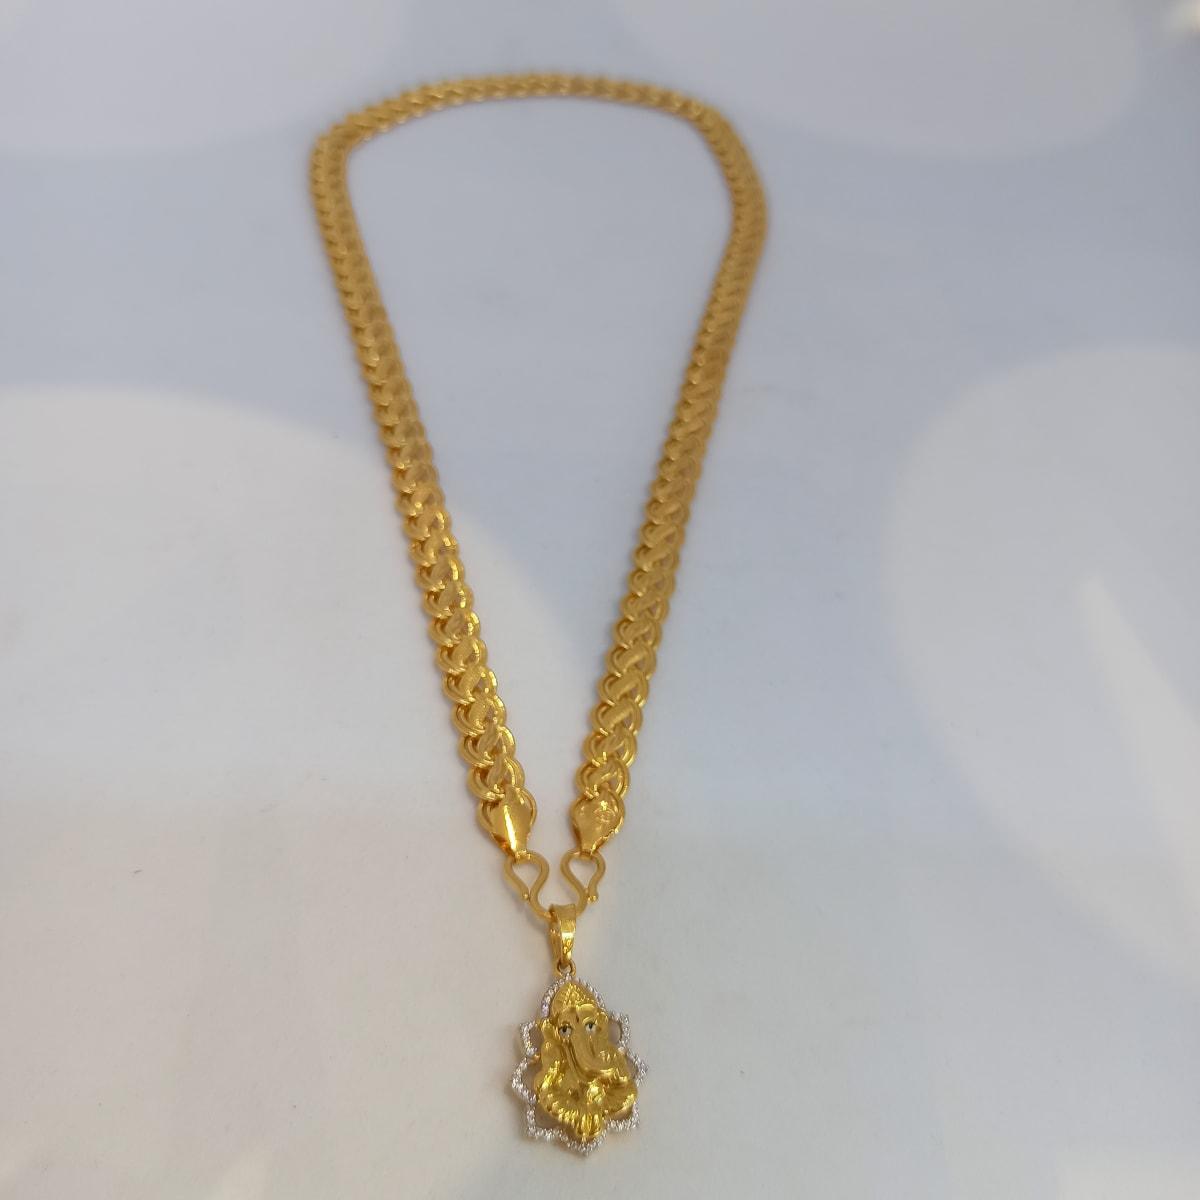 Ganesh Chain